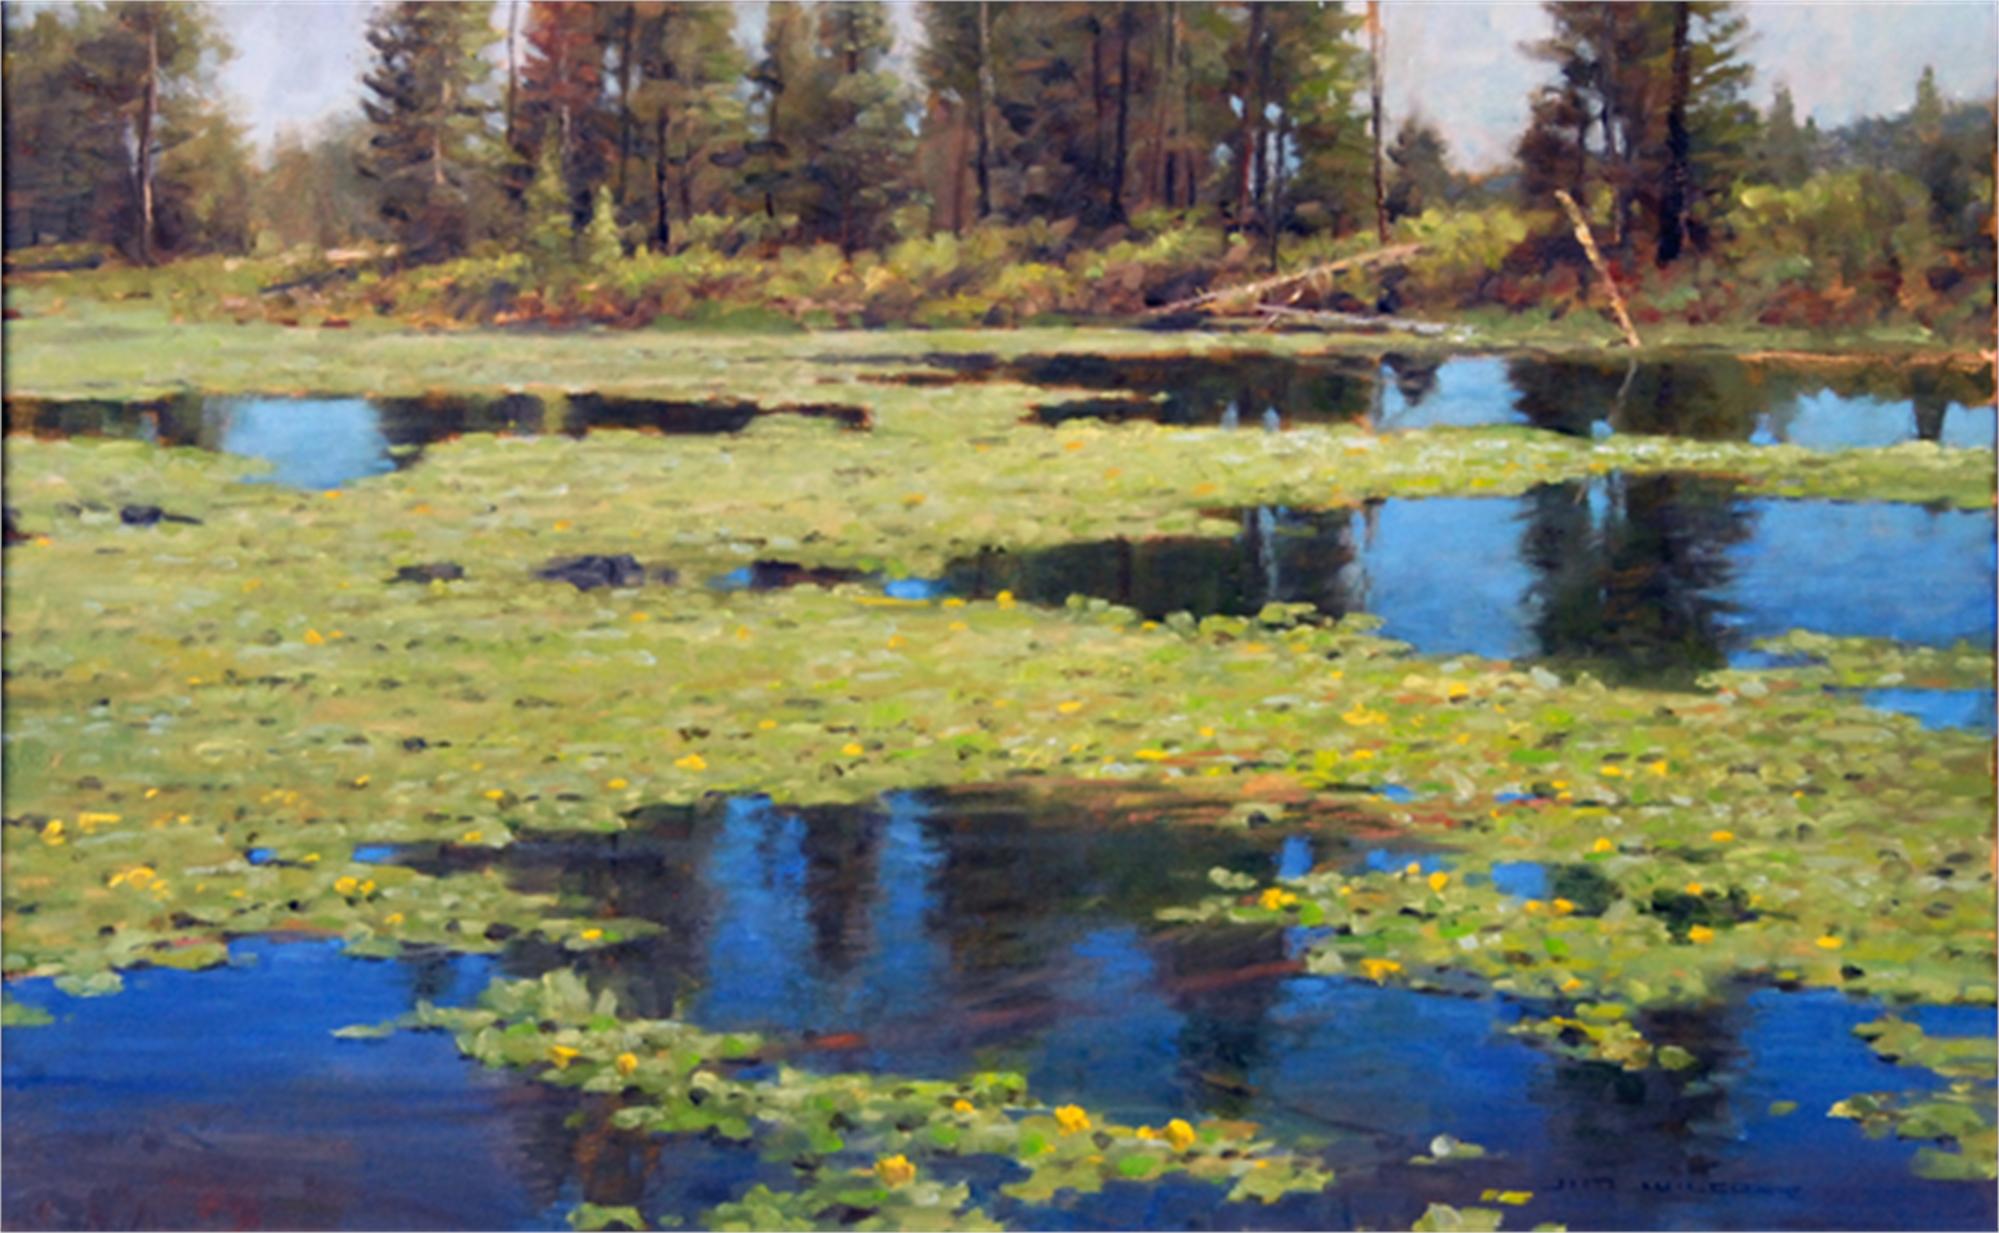 Floating Garden by Jim Wilcox